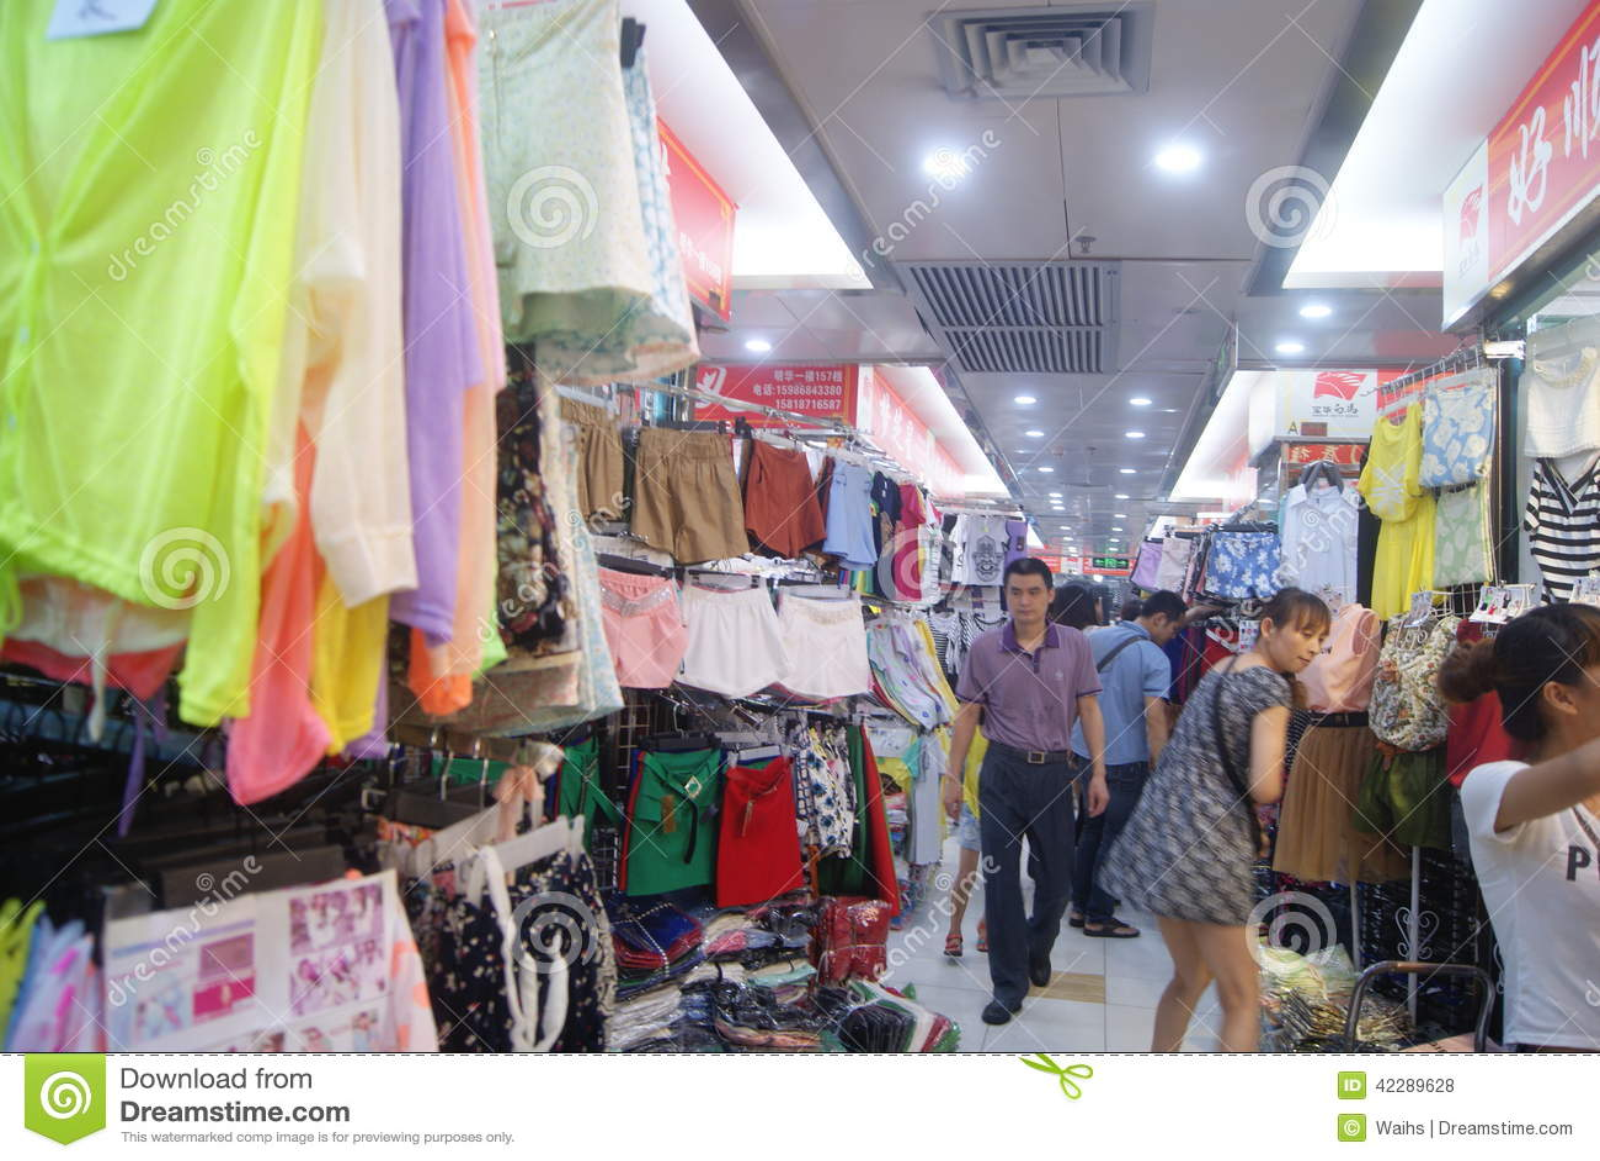 Merchant wholesaler